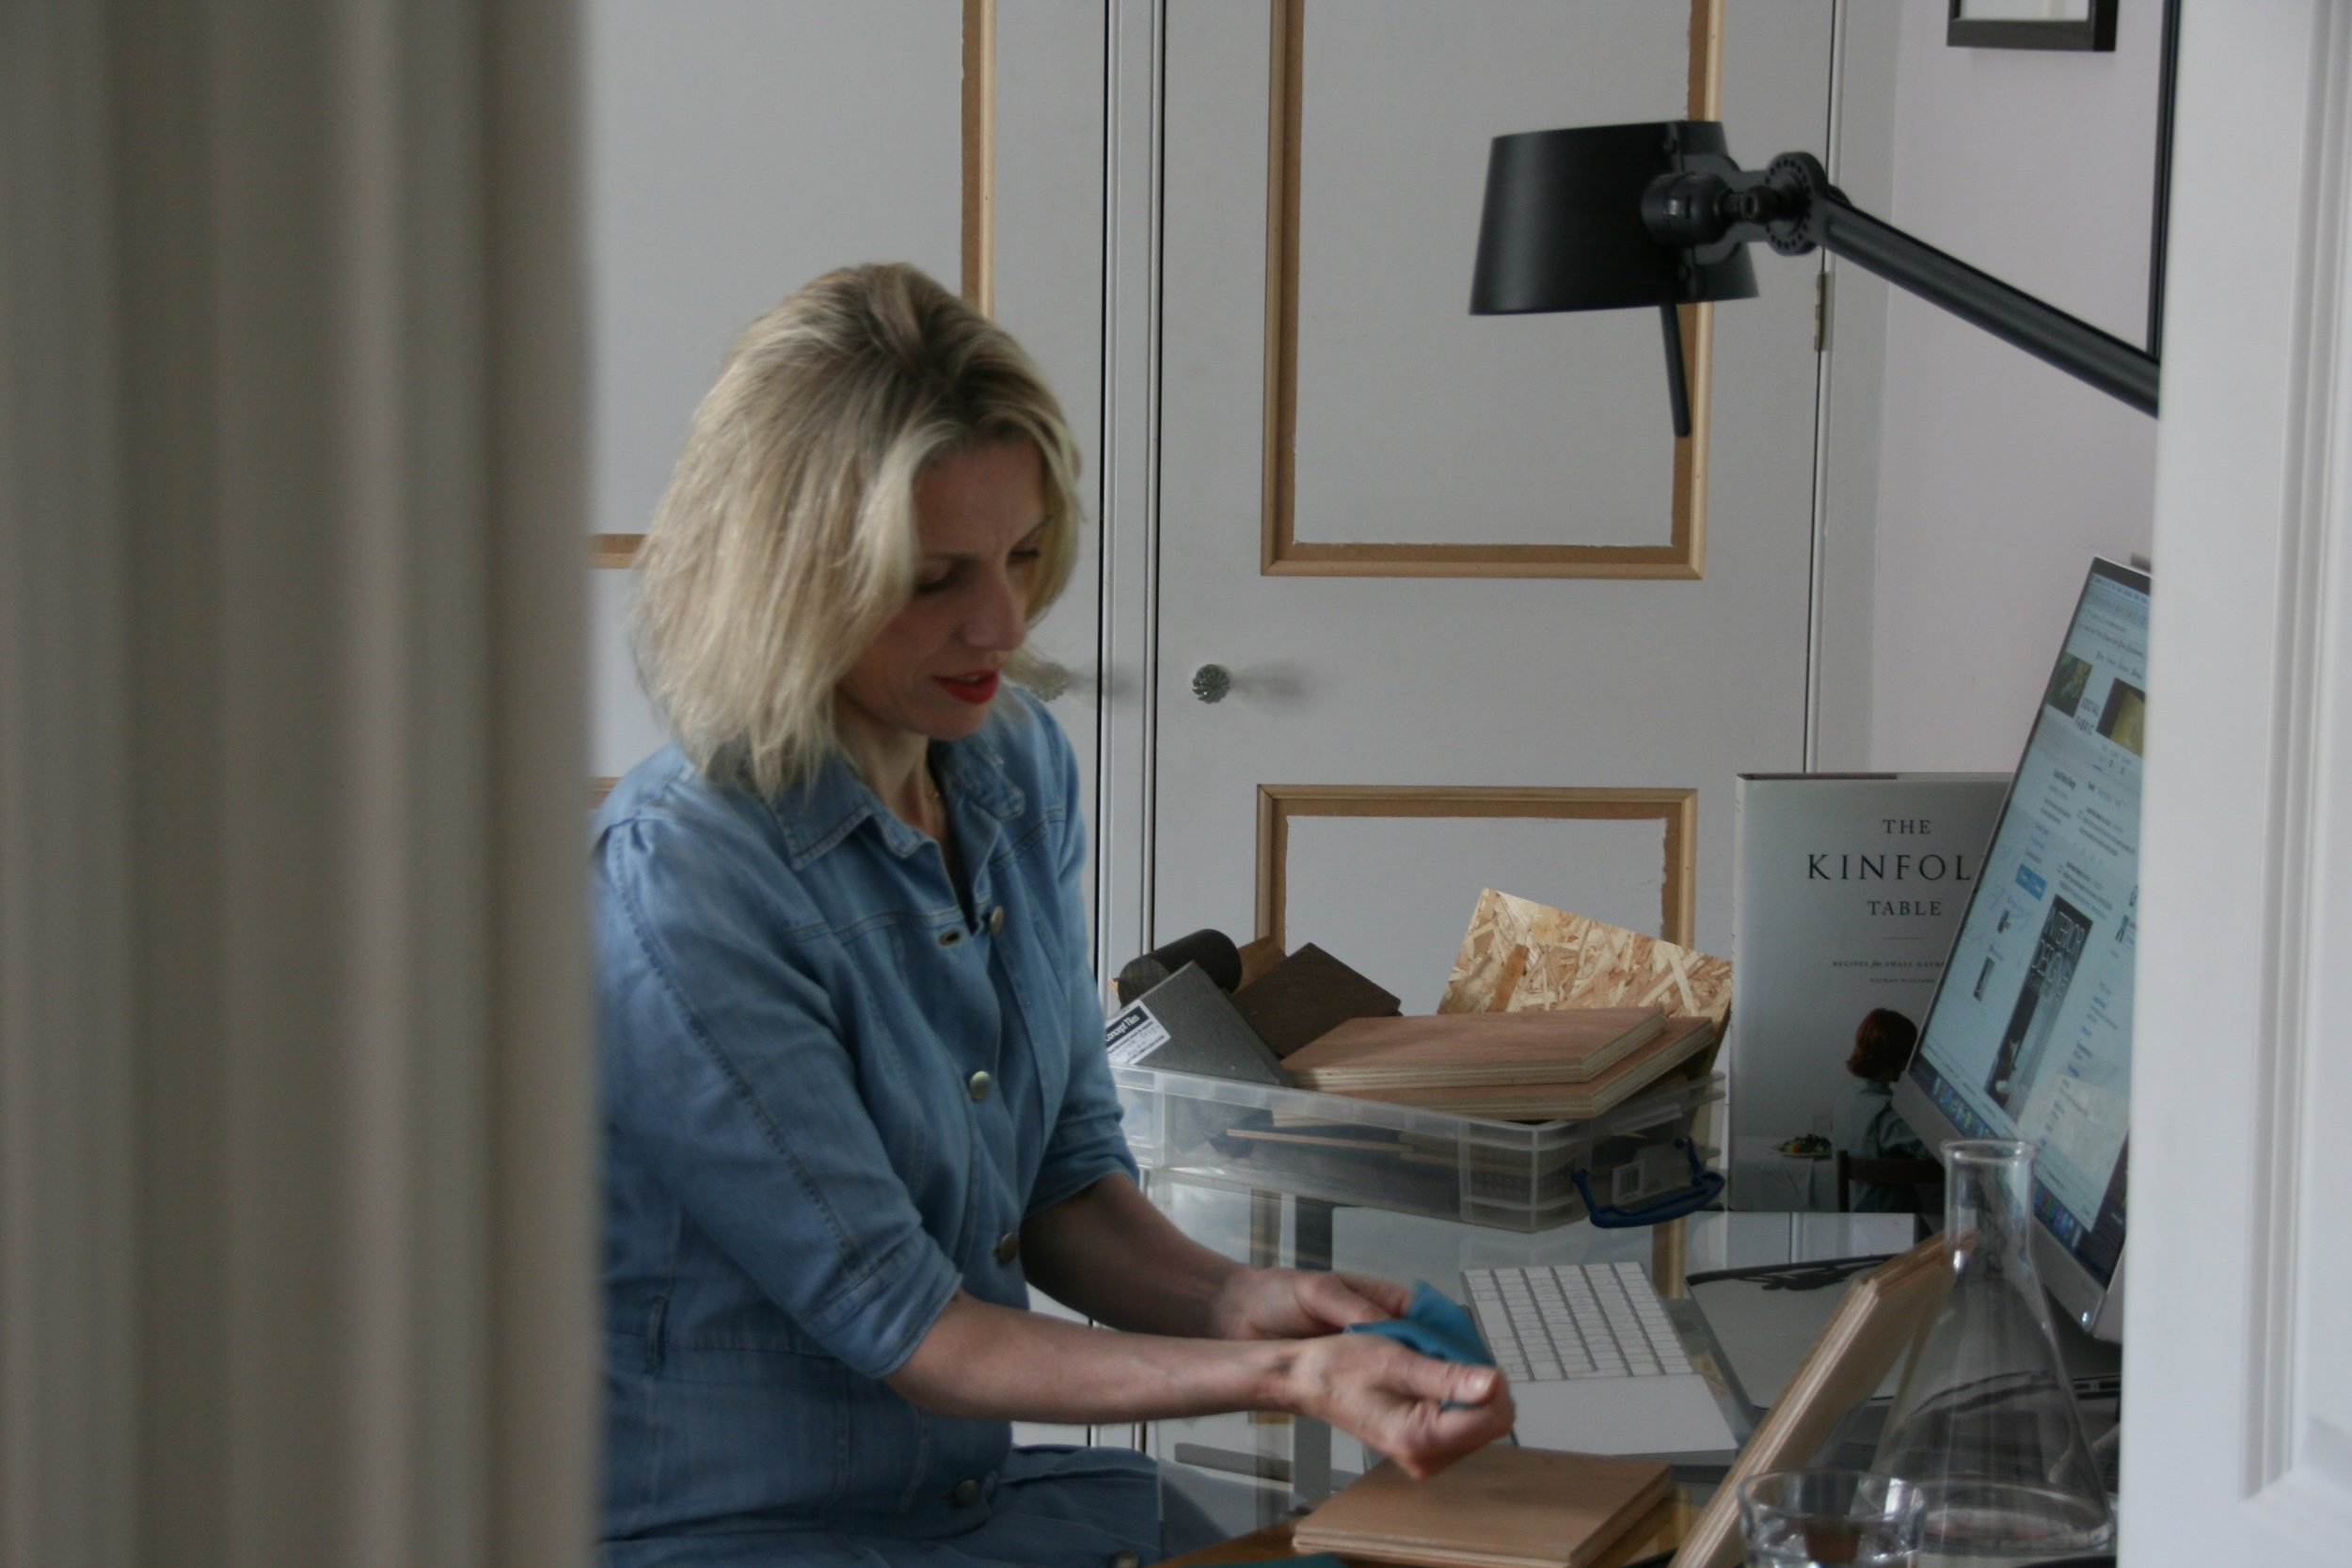 Natasha working on her restaurant design business.